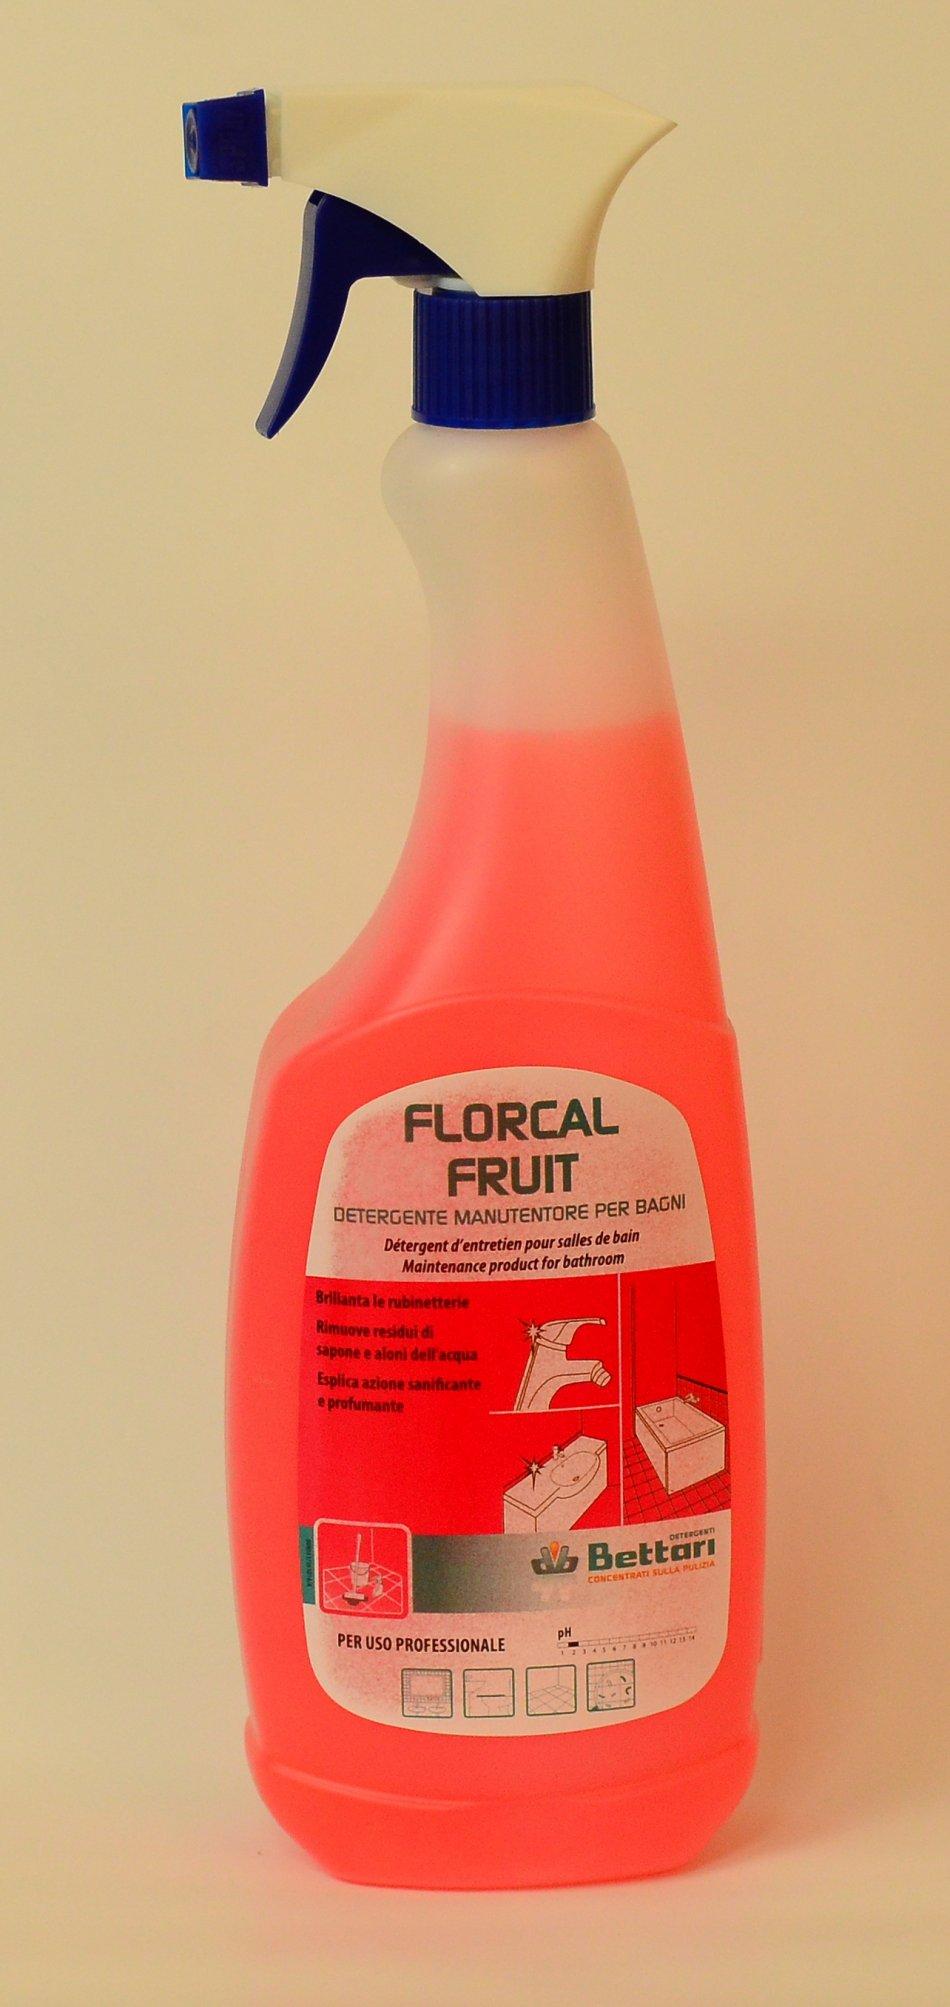 FLORCAL SX / FLORCAL FRUIT DETERGENT DE INTRETINERE PENTRU BAIE